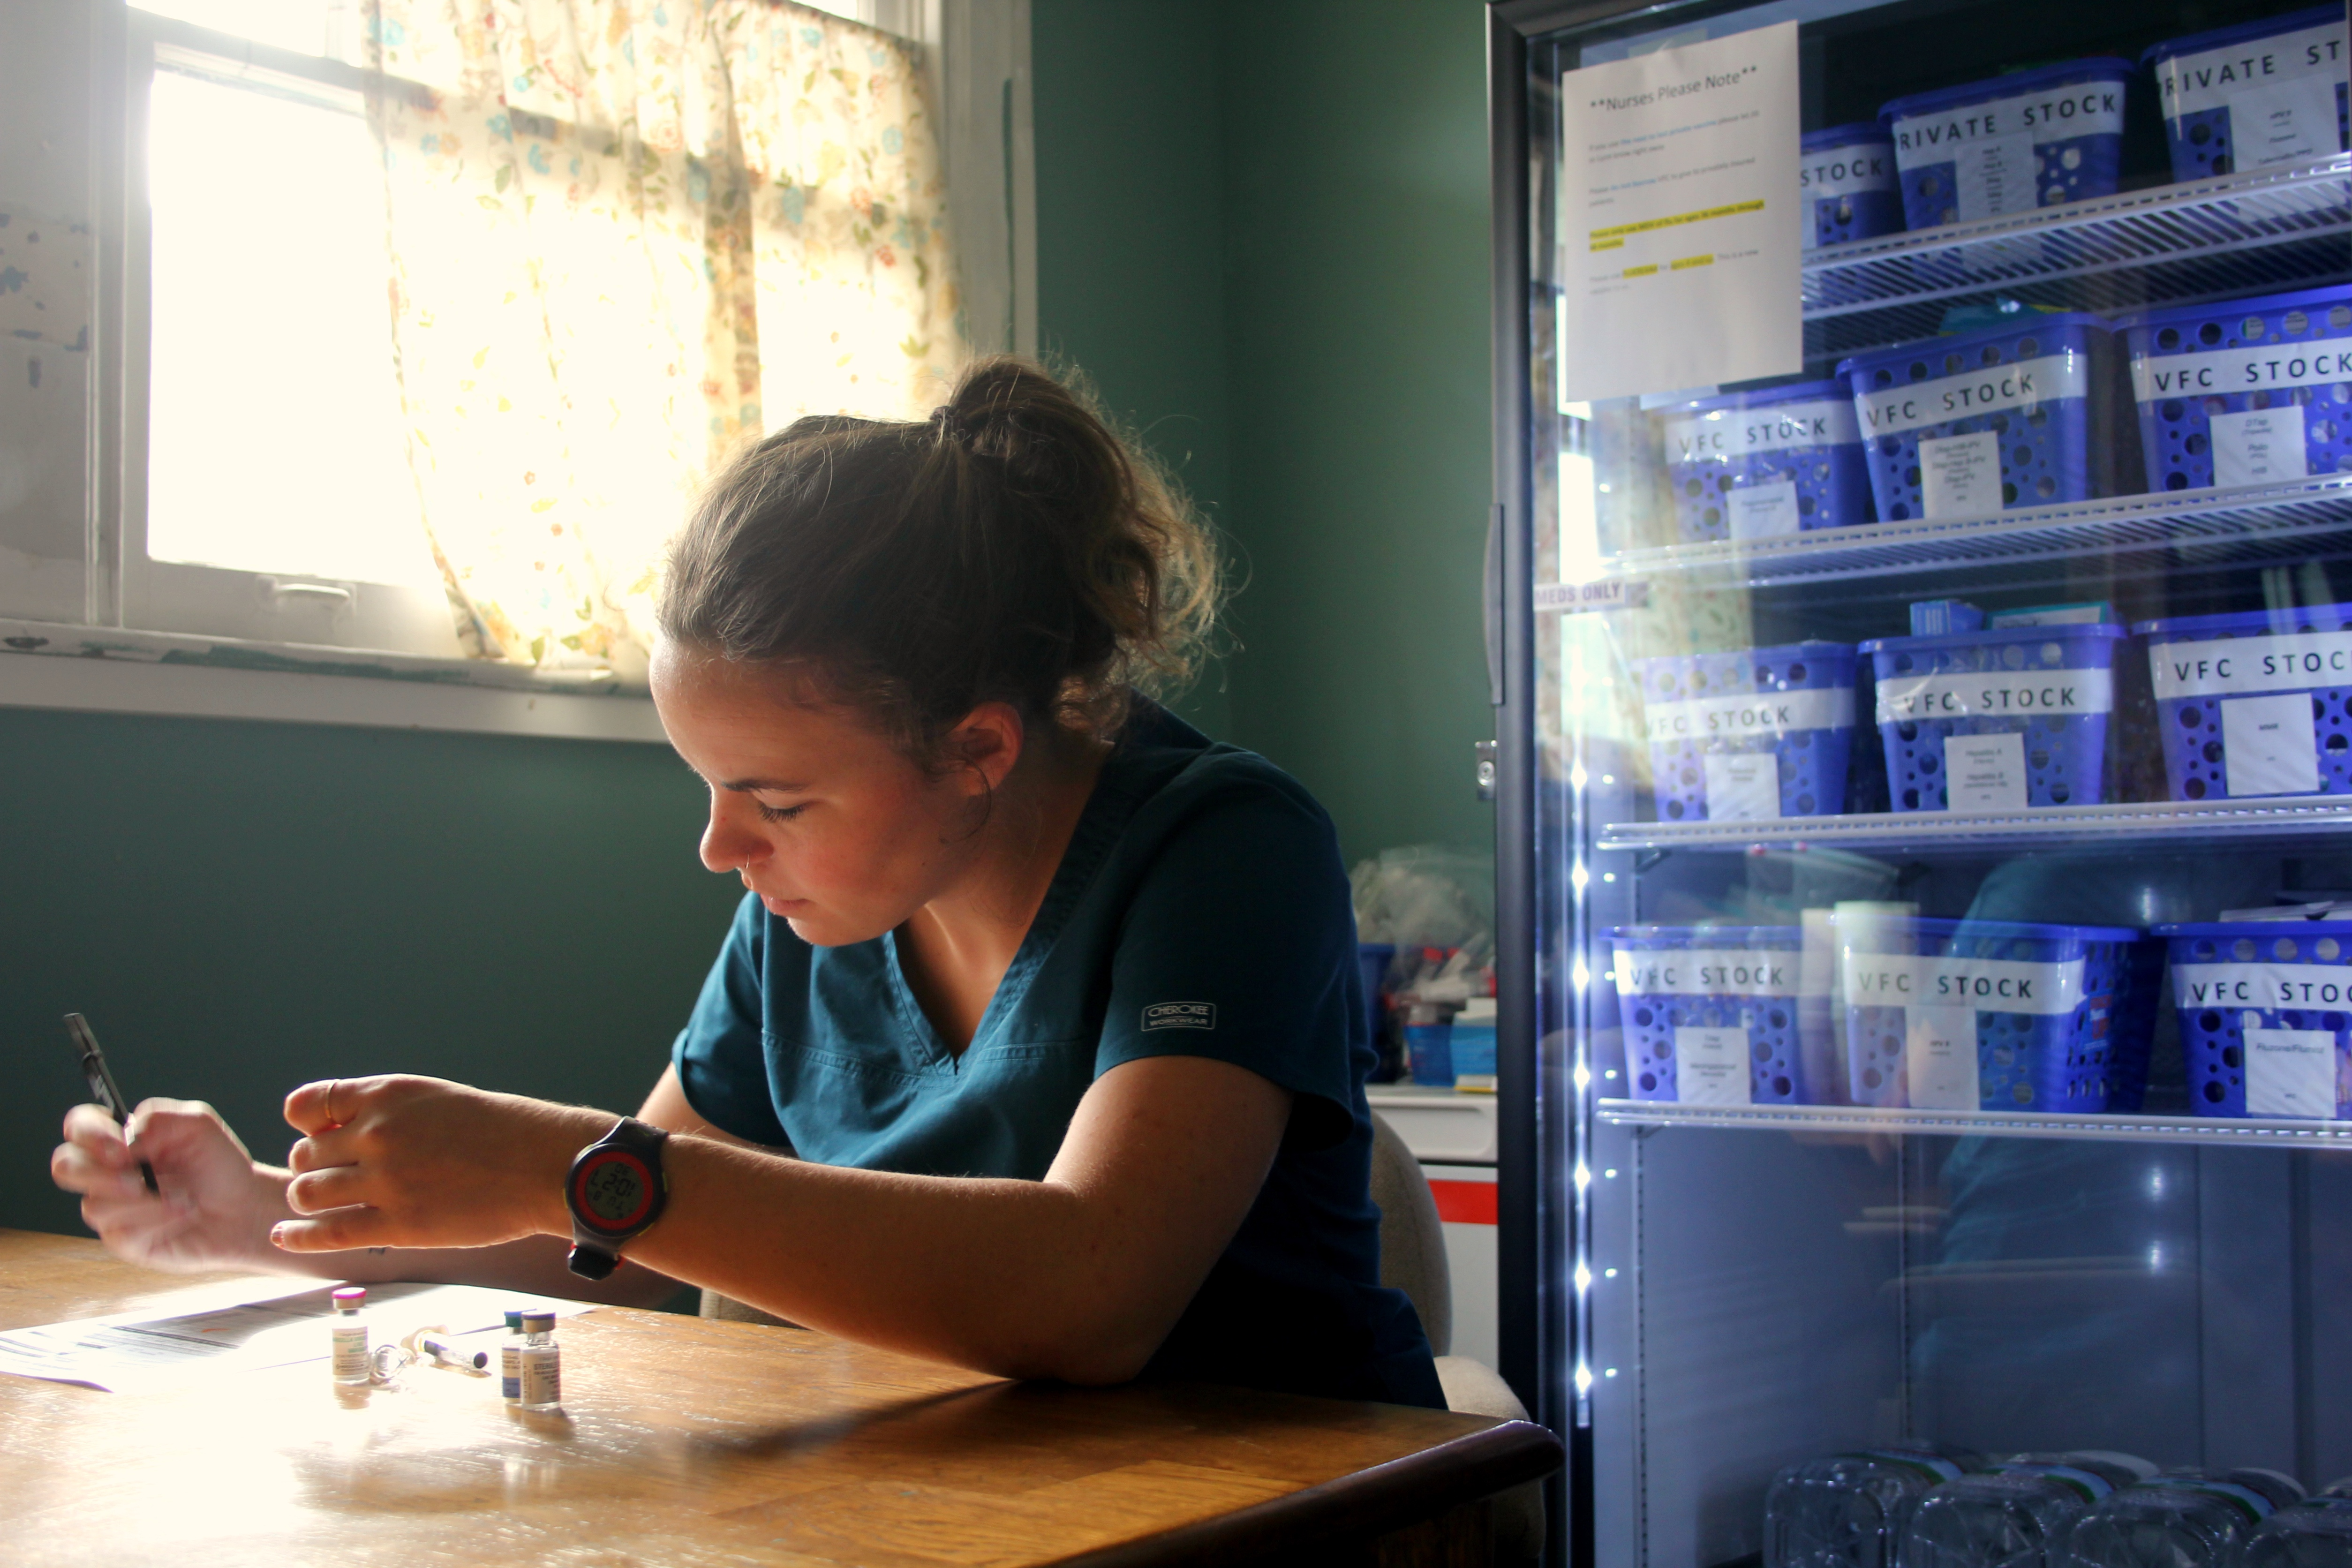 Pediatrics at LifeSpring Community Health